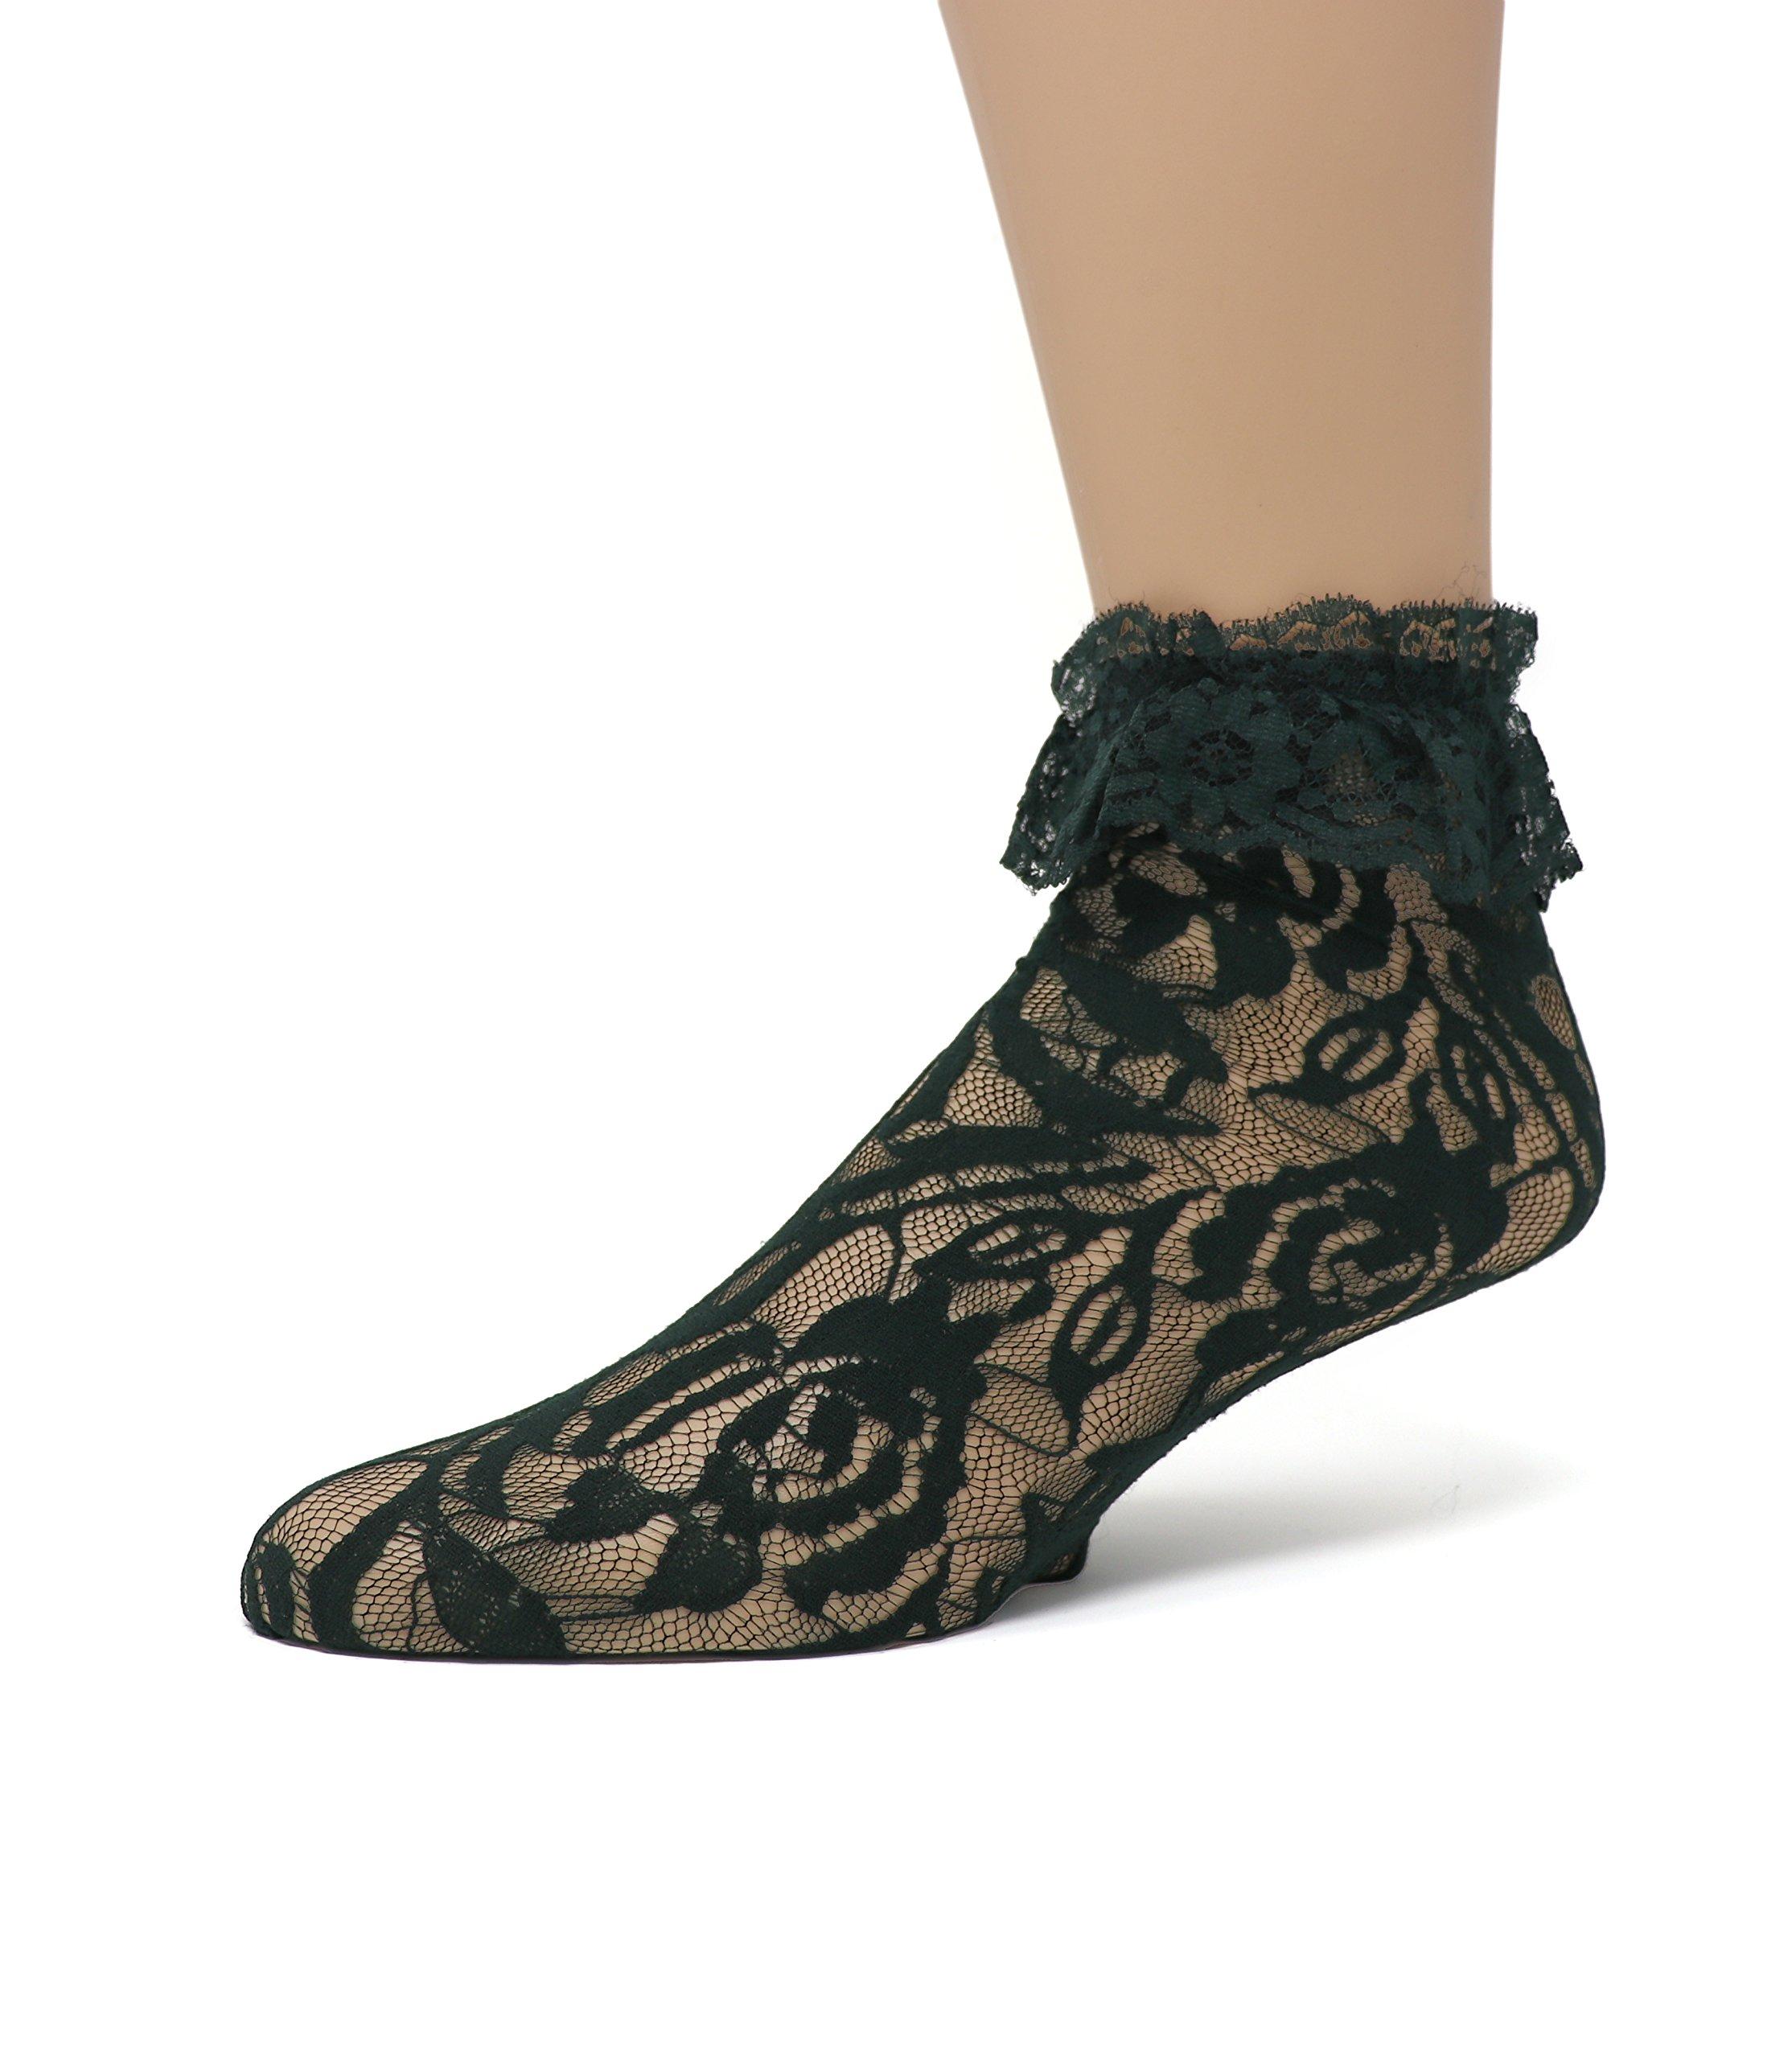 EMEM Apparel Women's Ladies Lace Anklet Ankle Quarter Socks Stockings with Ruffle Hunter Green 9-11